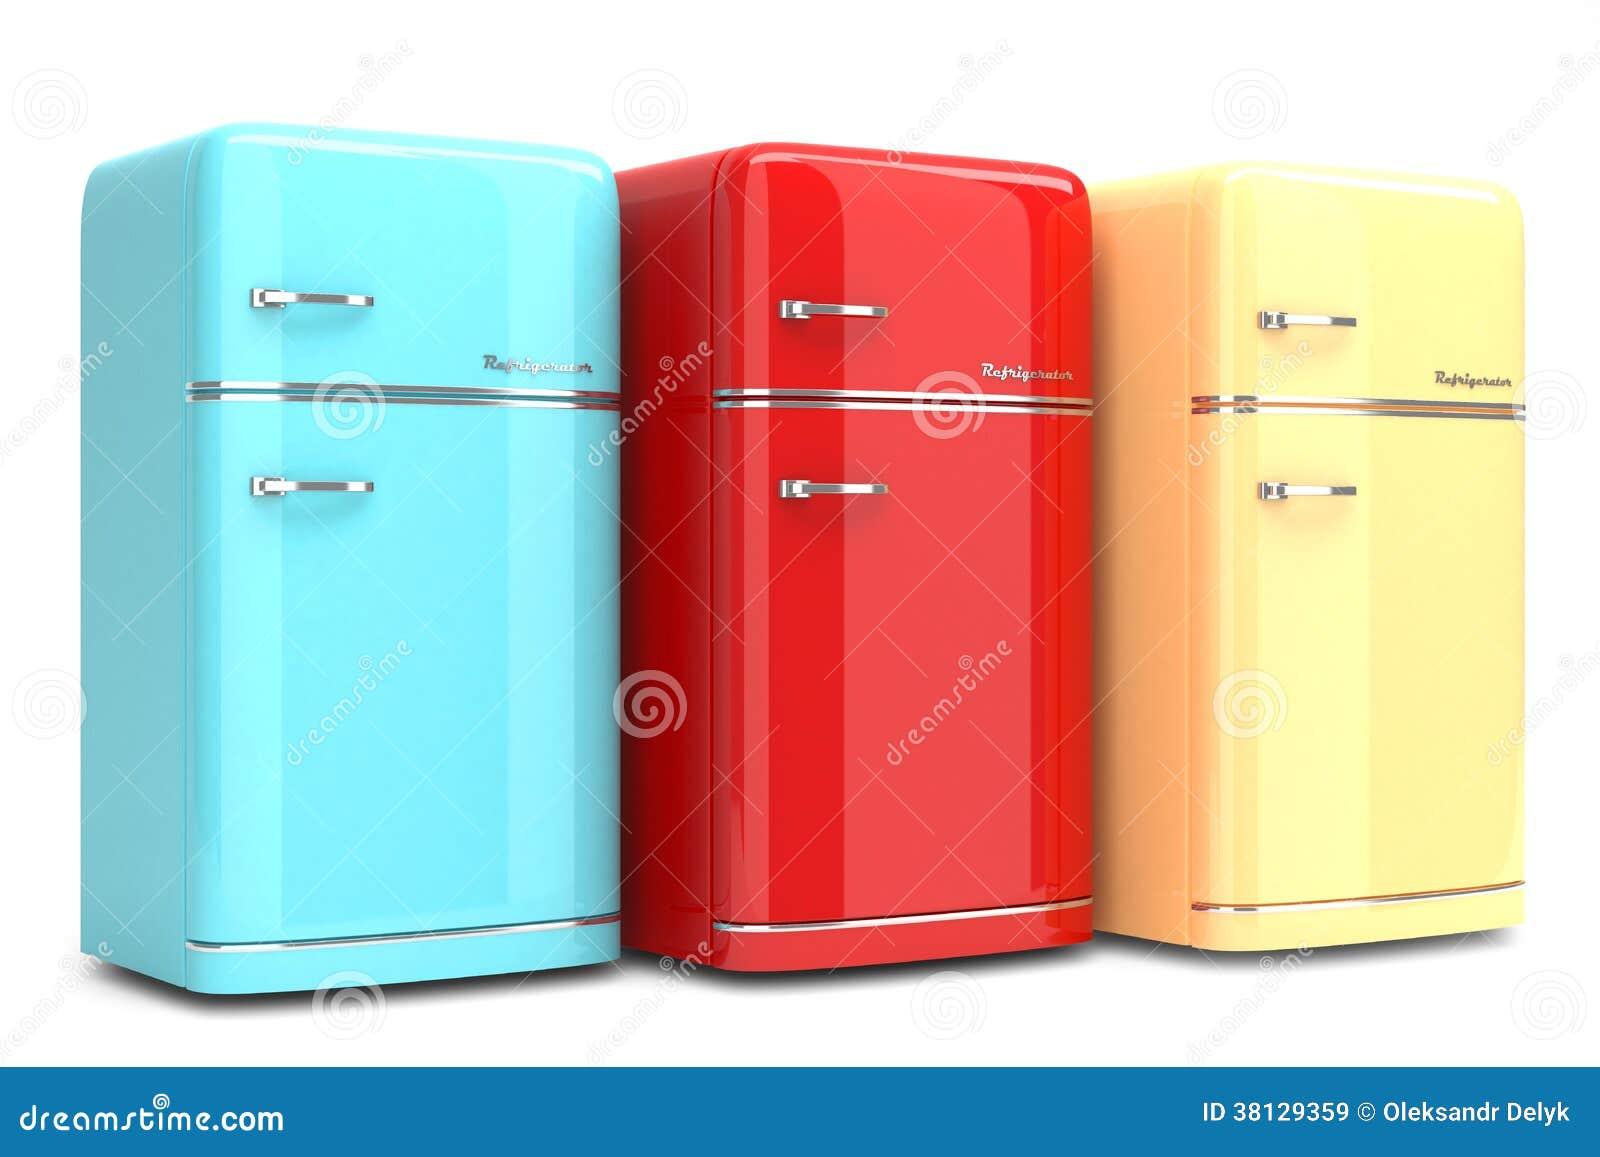 retro refrigerators royalty free stock images image